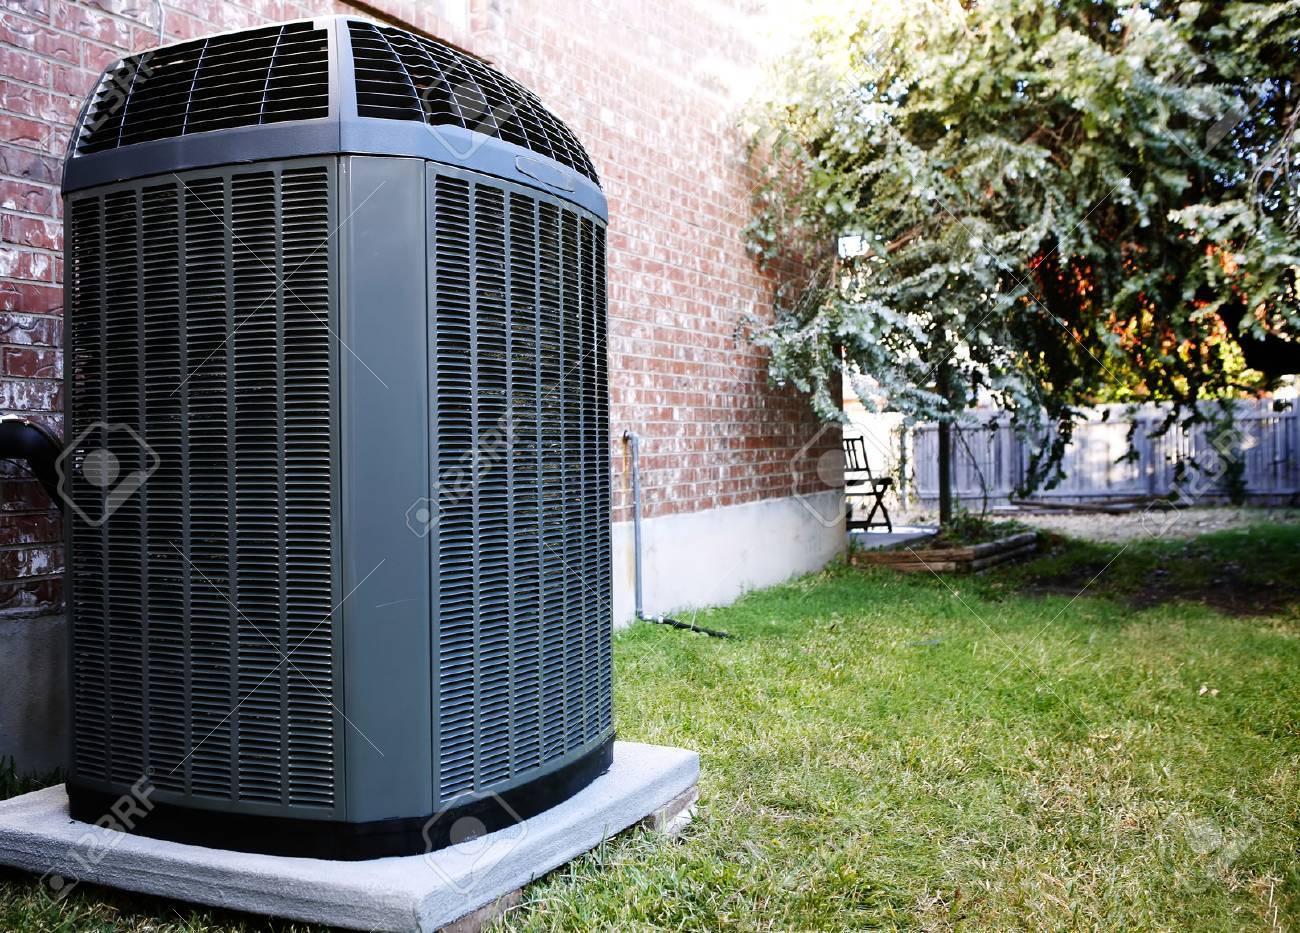 High efficiency modern AC-heater unit, energy save solution - 39231906